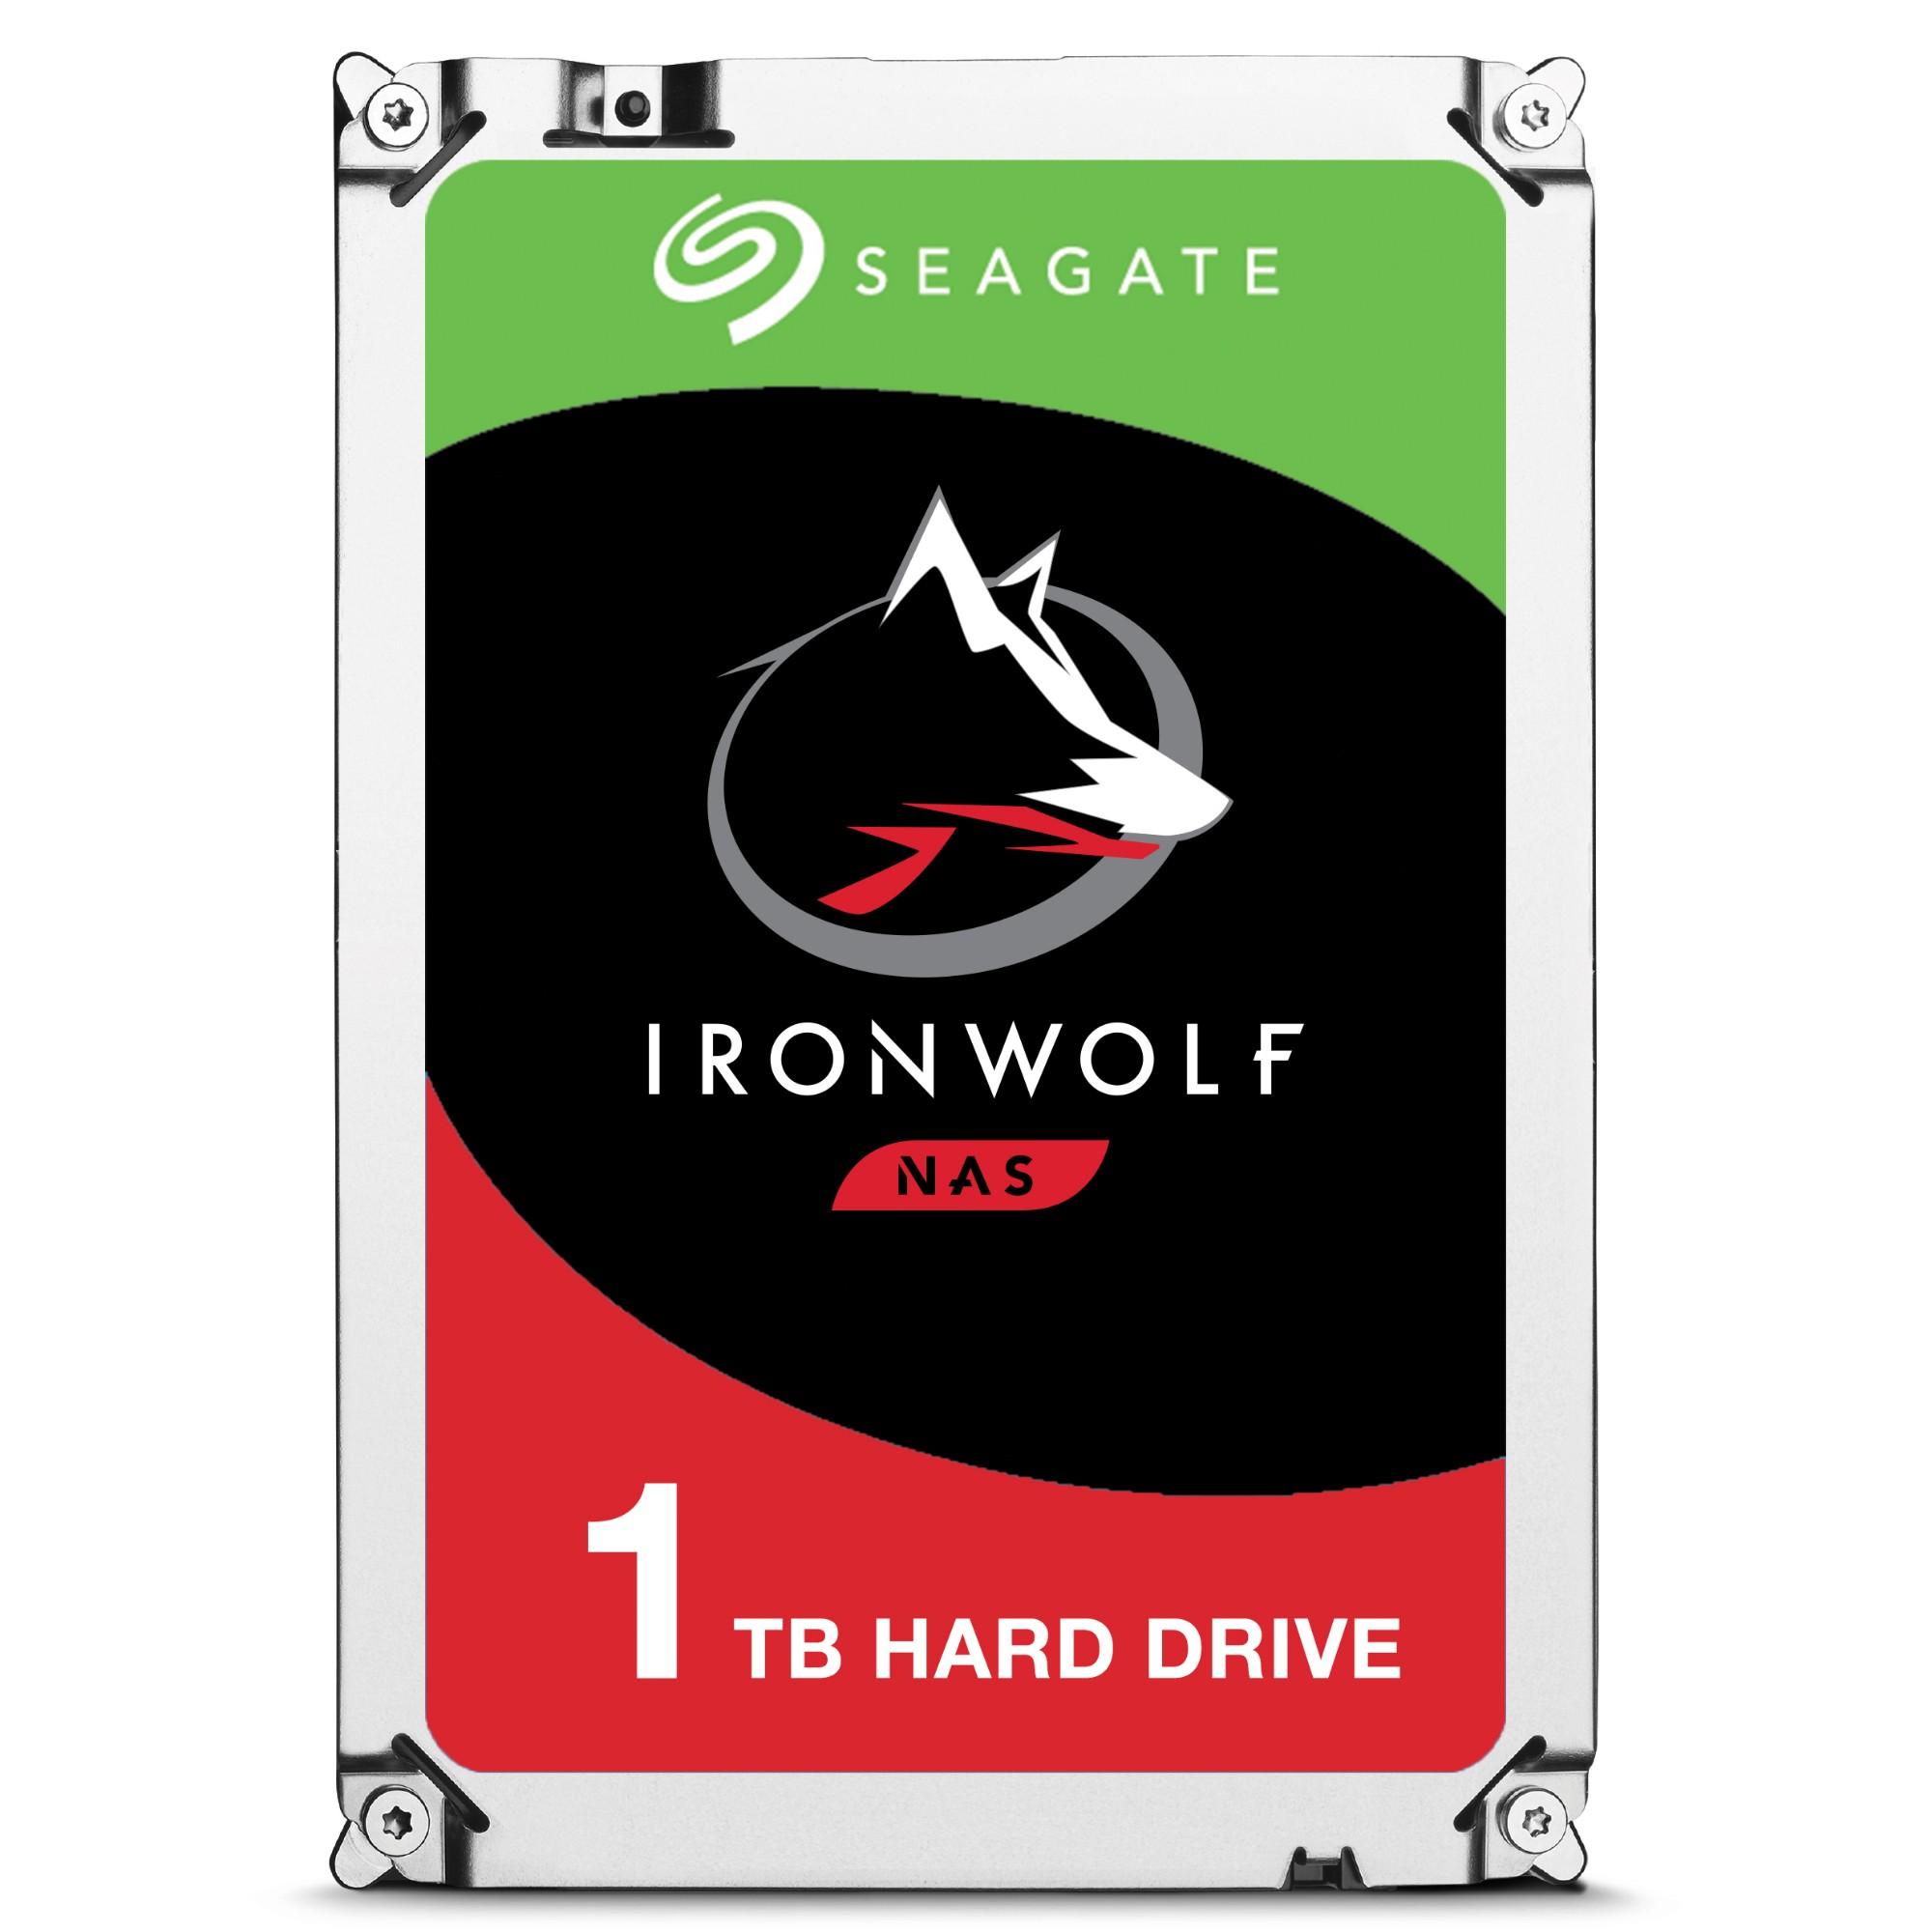 Seagate IronWolf ST1000VN002 HDD 1000GB Serial ATA III internal hard drive